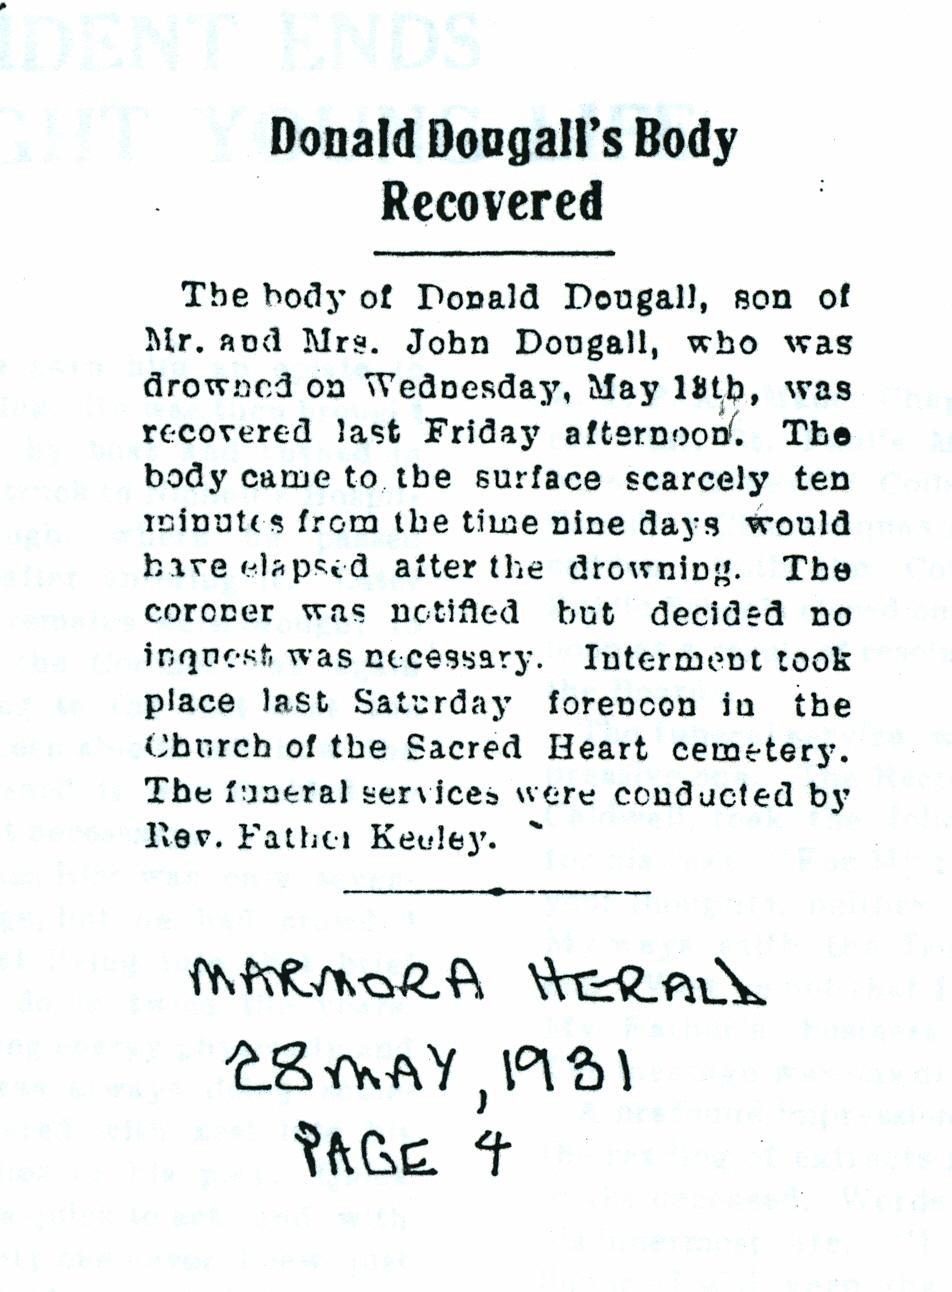 Dougall, Donald, drowning 1931.jpg